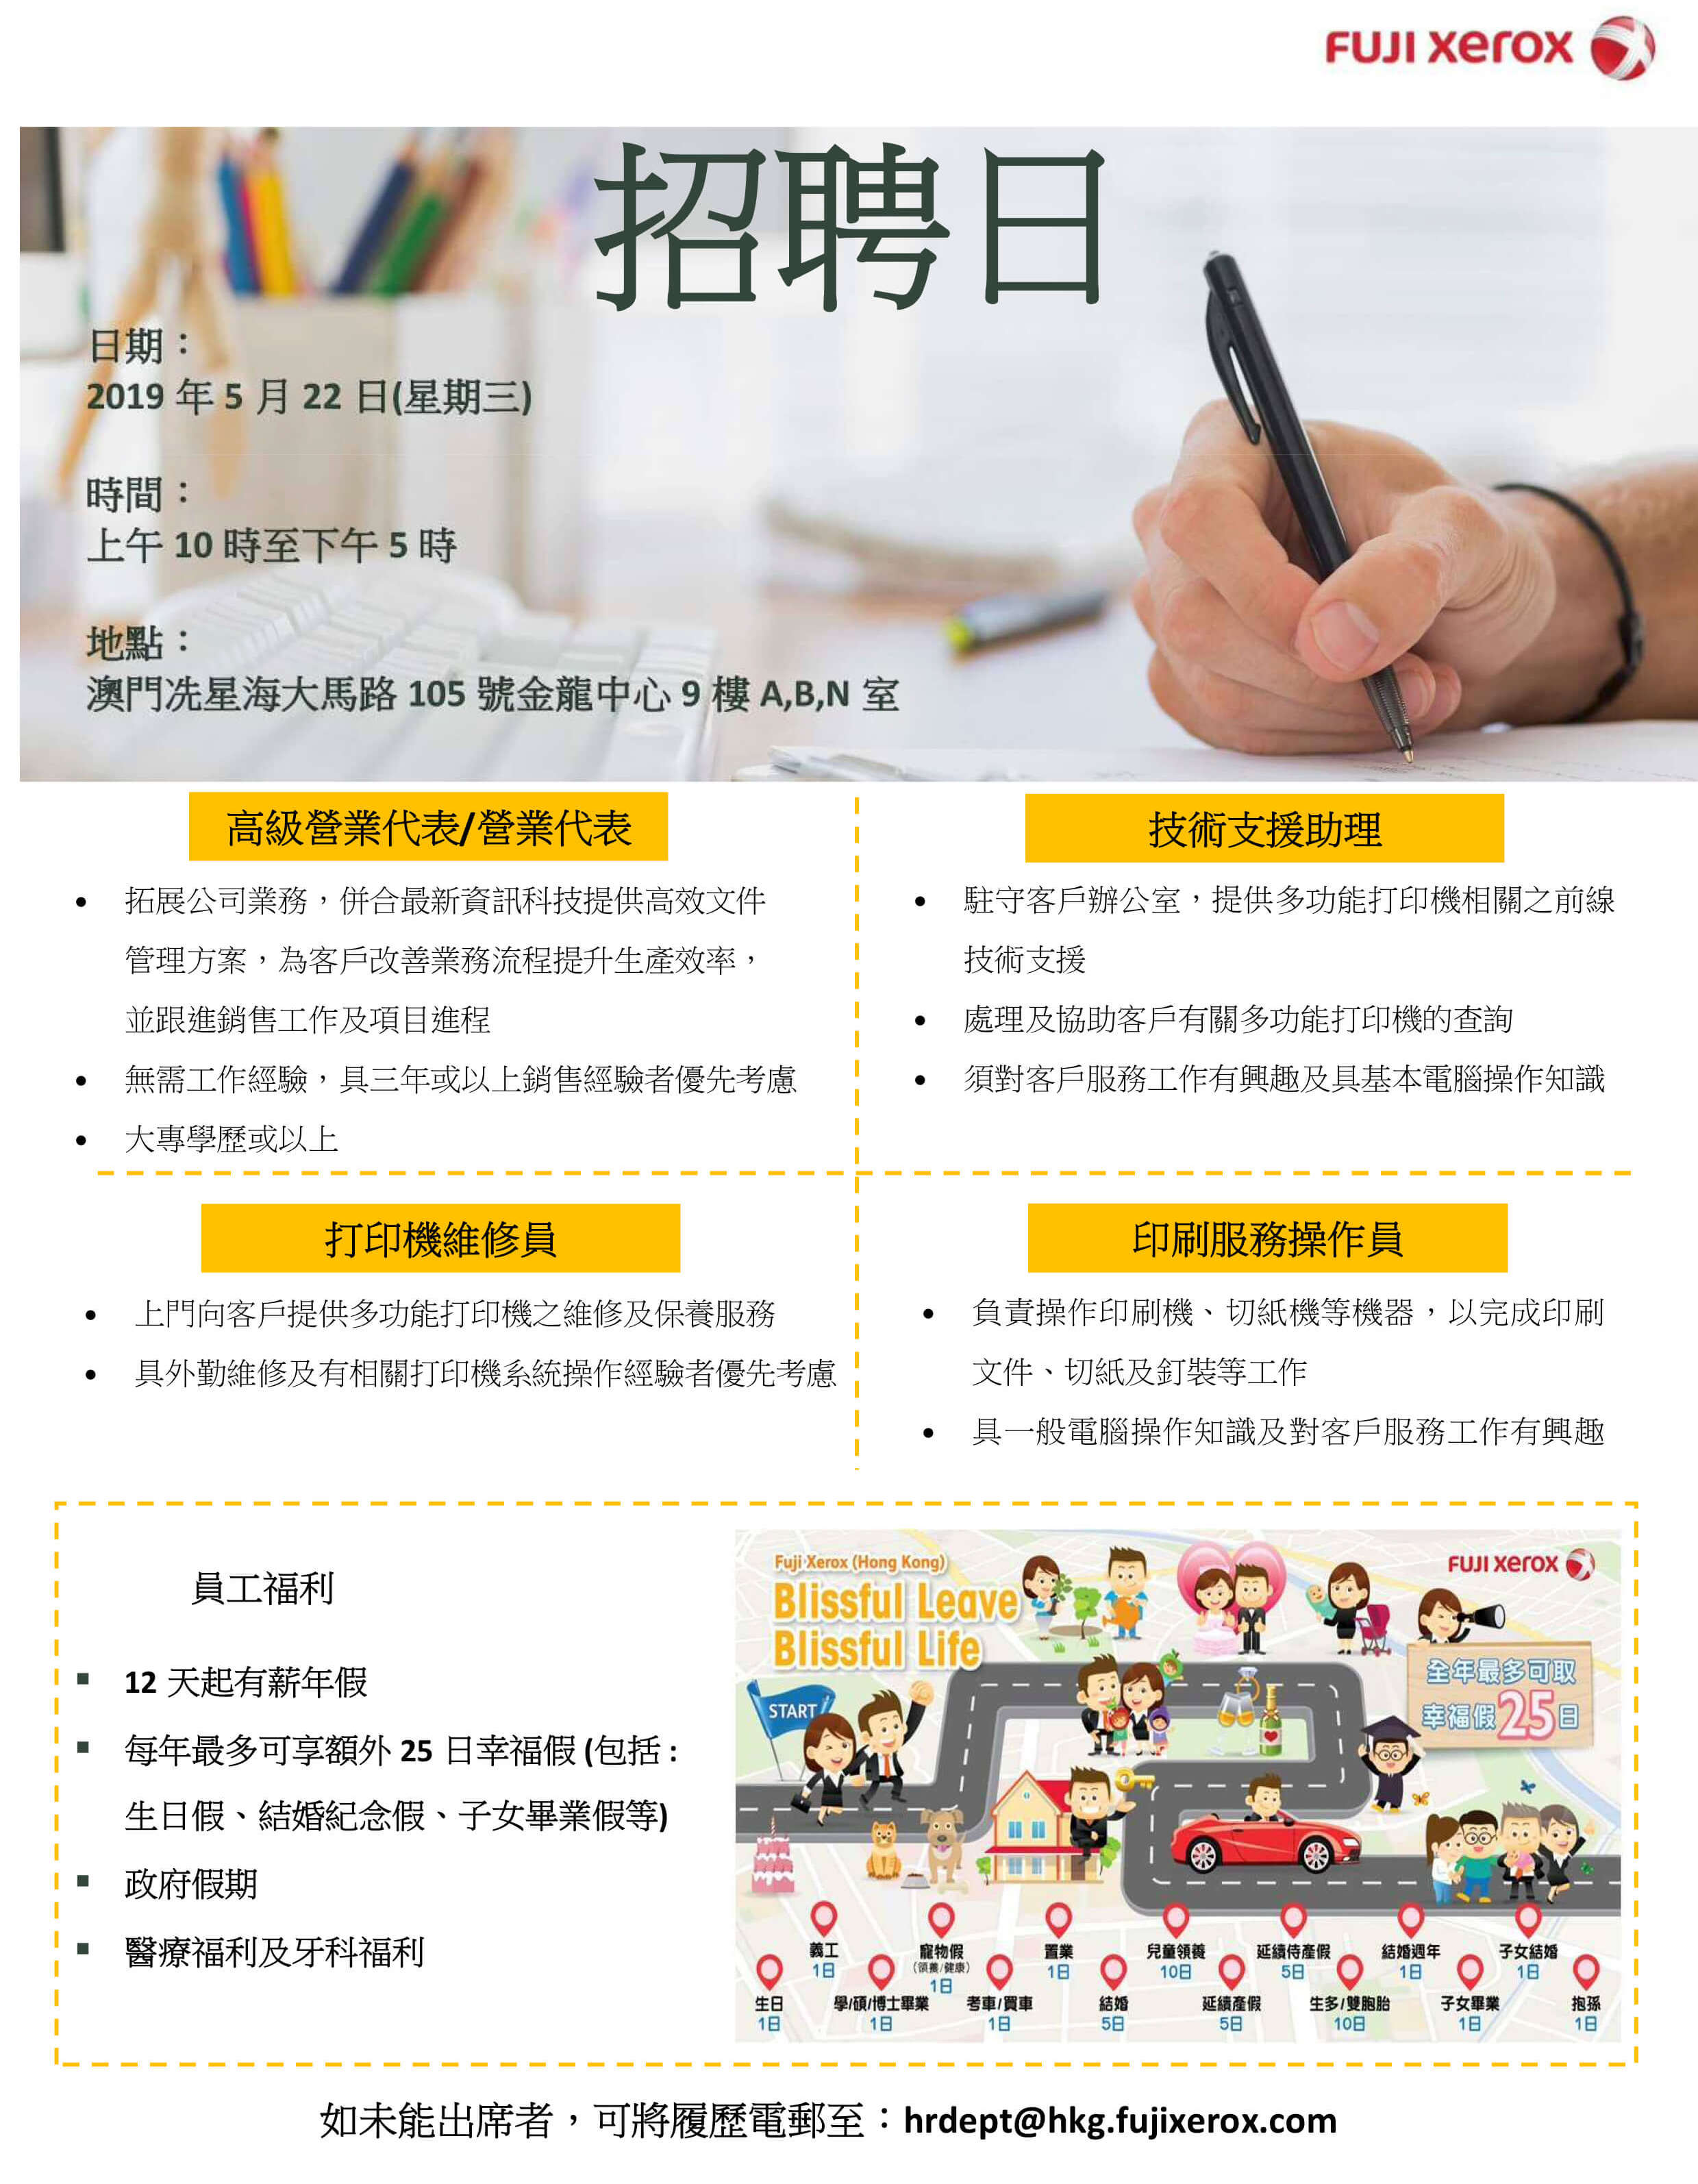 Macau _ Advertisement _Jobscall.me ( For 17 May posting).jpg